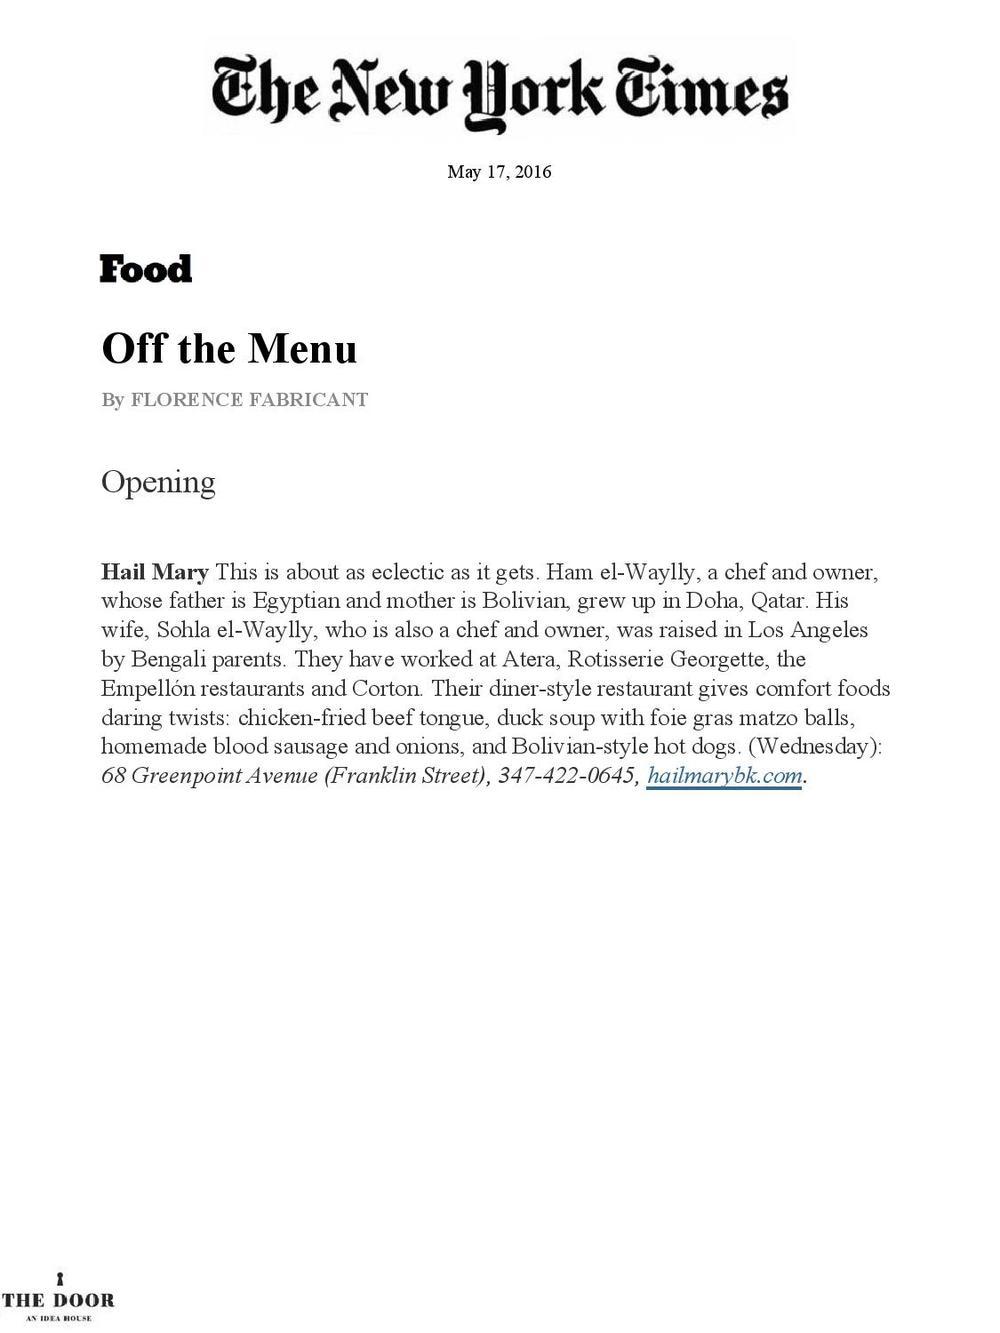 TheNewYorkTimes_HailMary_5.17.16 (1)-page-001.jpg